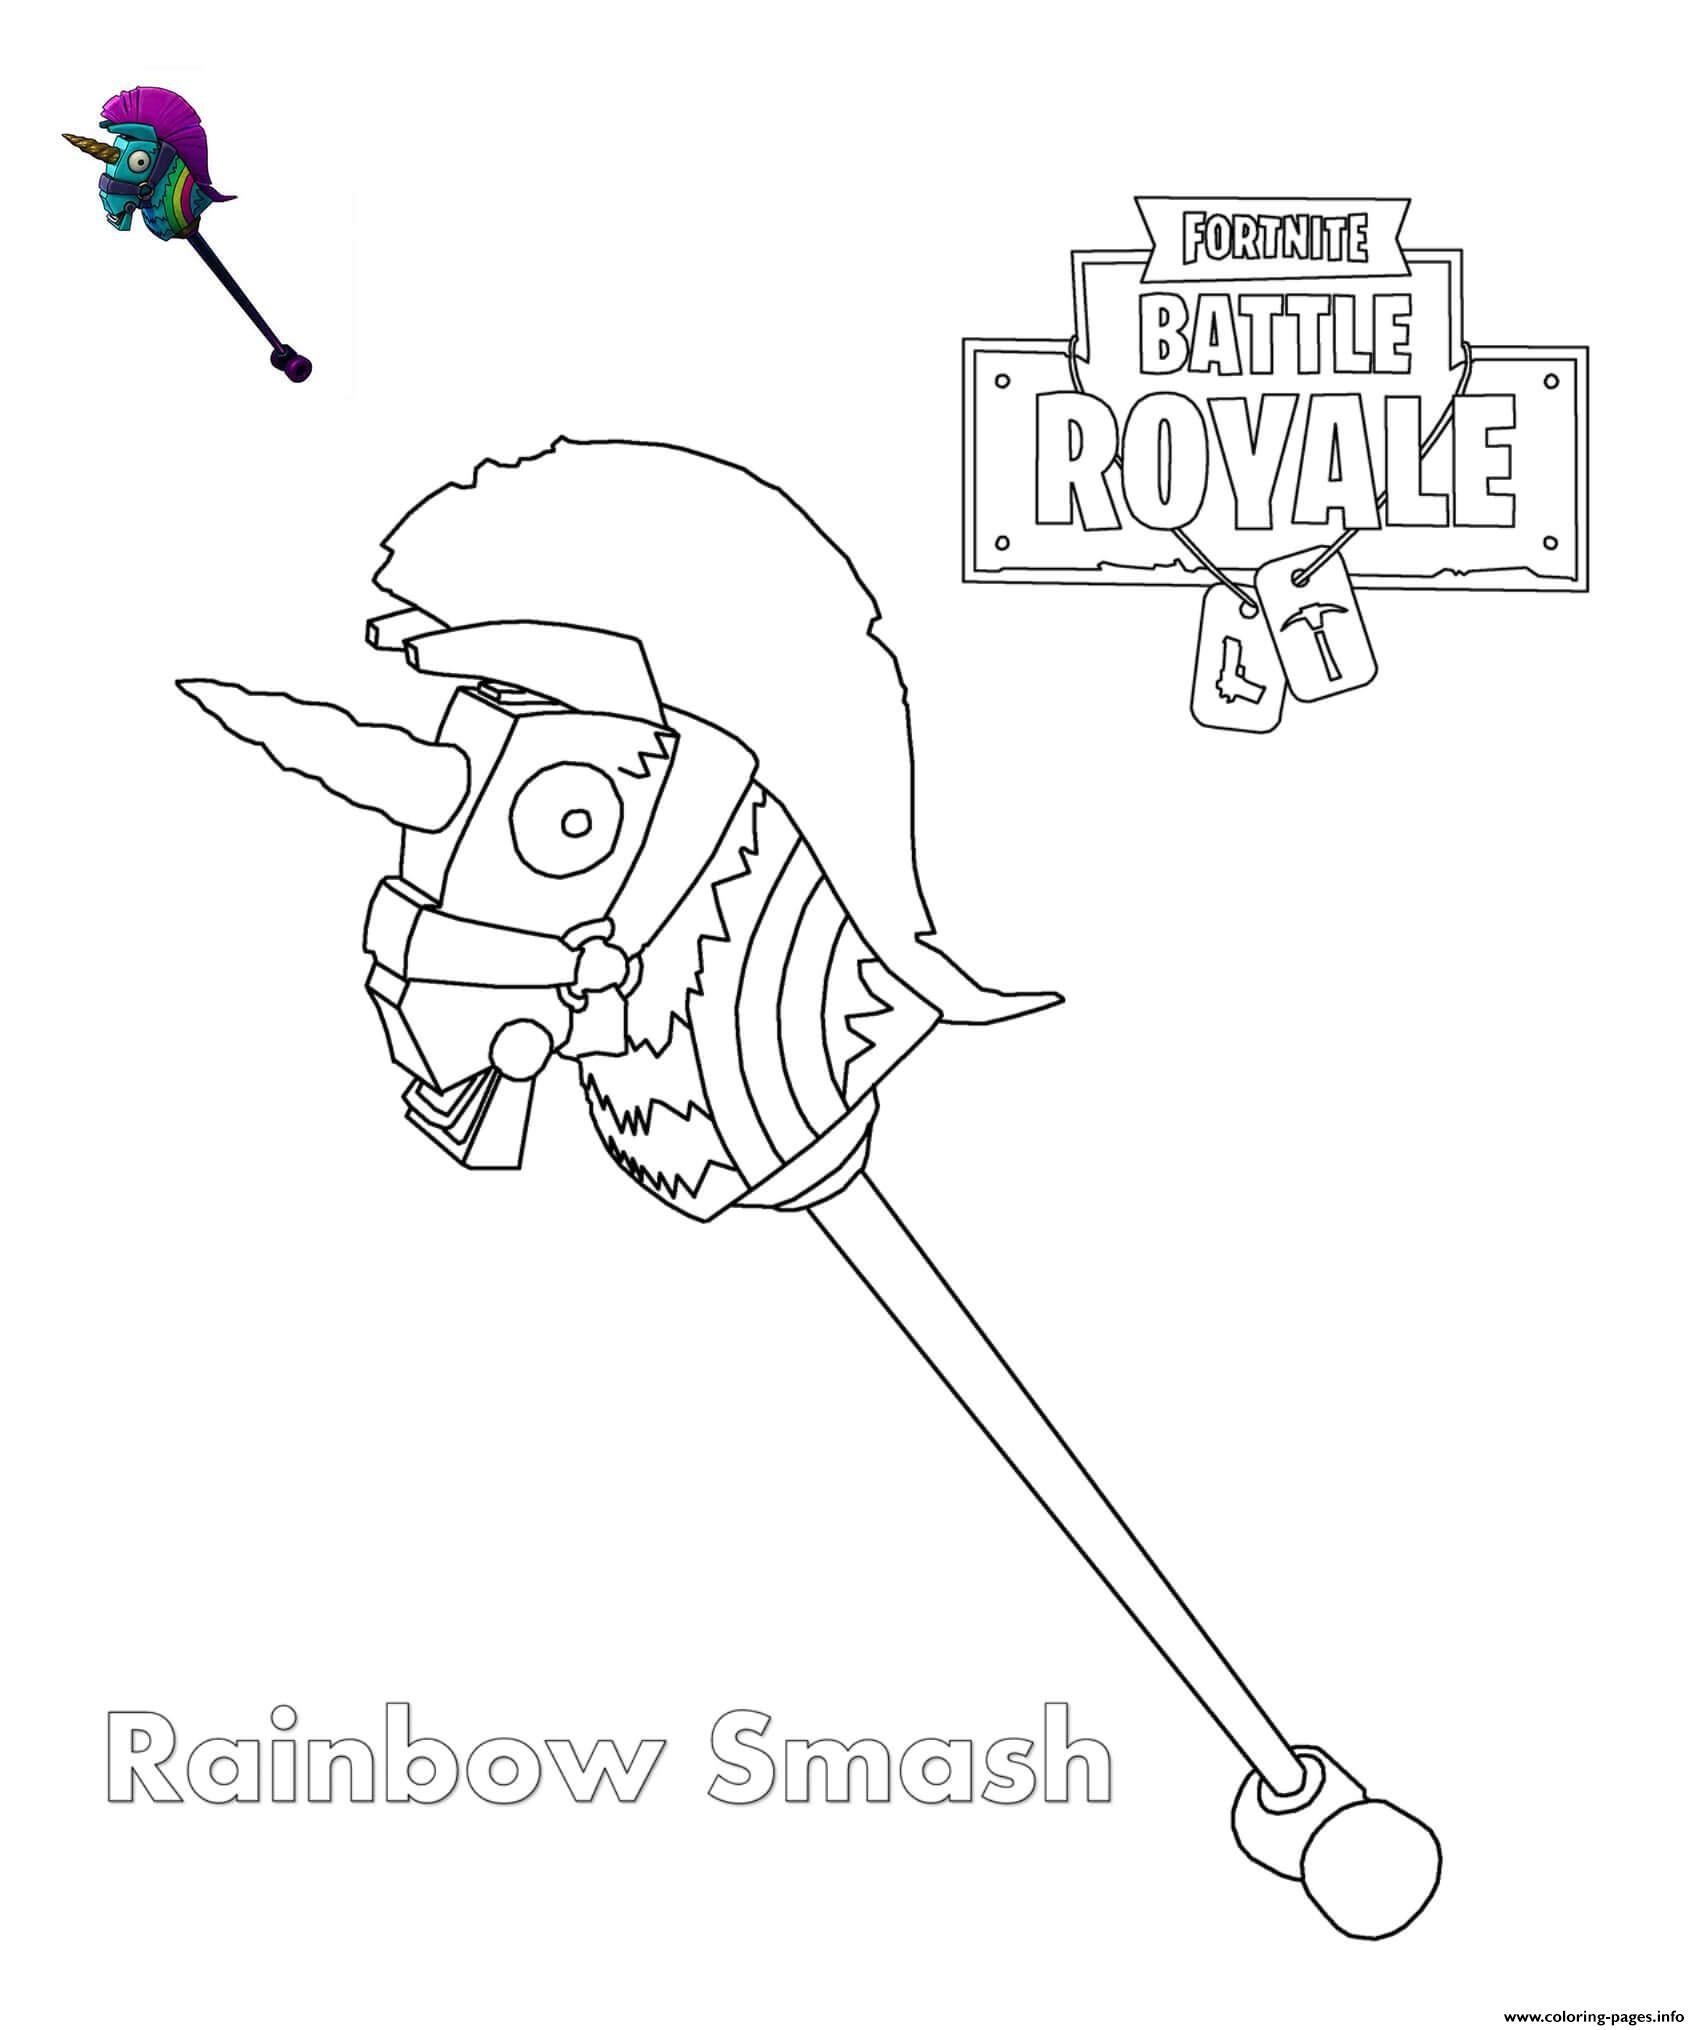 Print Rainbow Smash Fortnite Coloring Pages Jons 10th Birthday